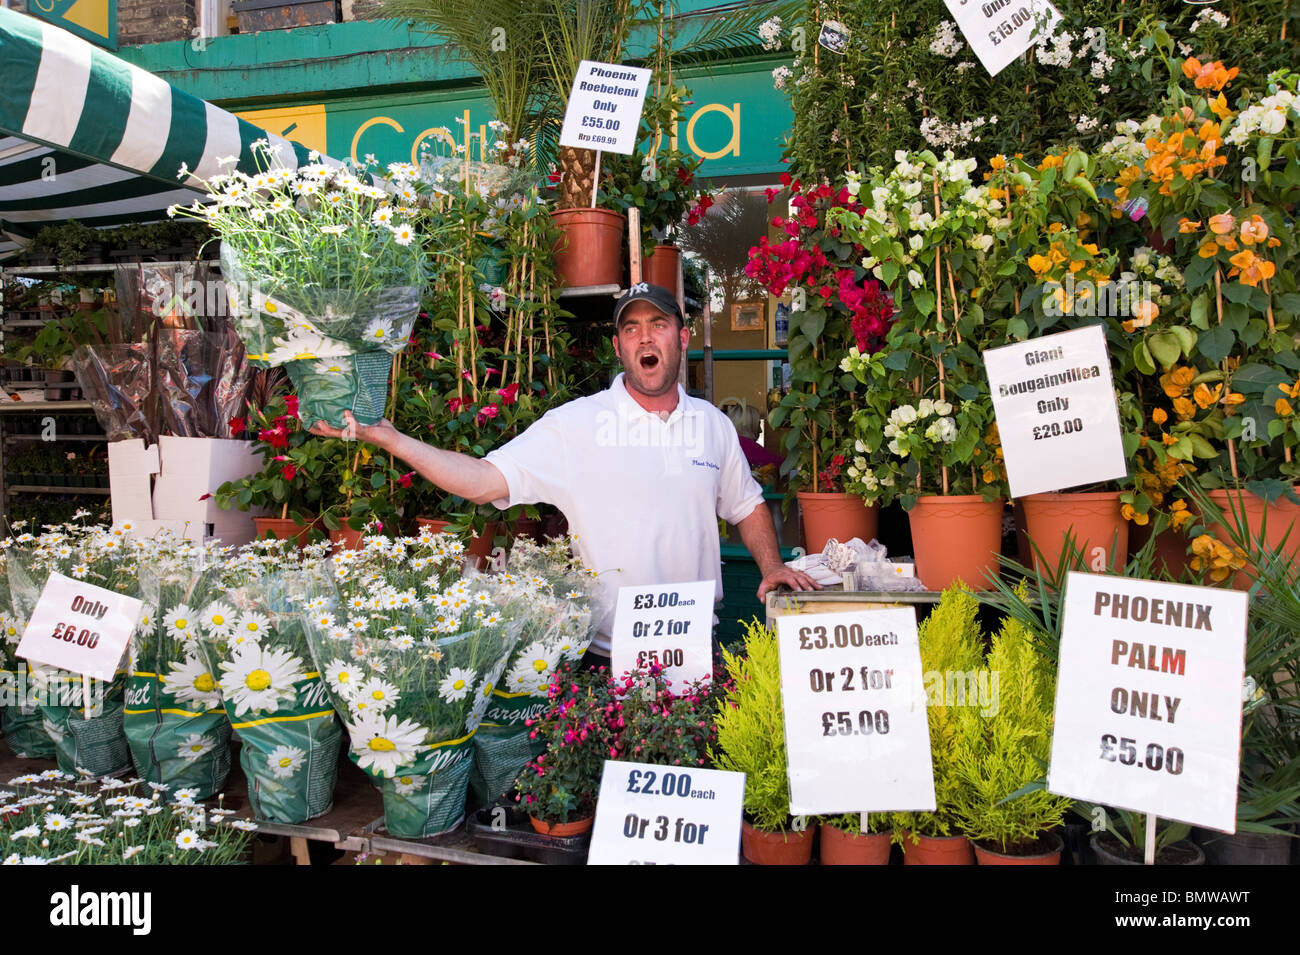 Street trader selling flowers at Columbia Road Flower Market, London, England, UK - Stock Image